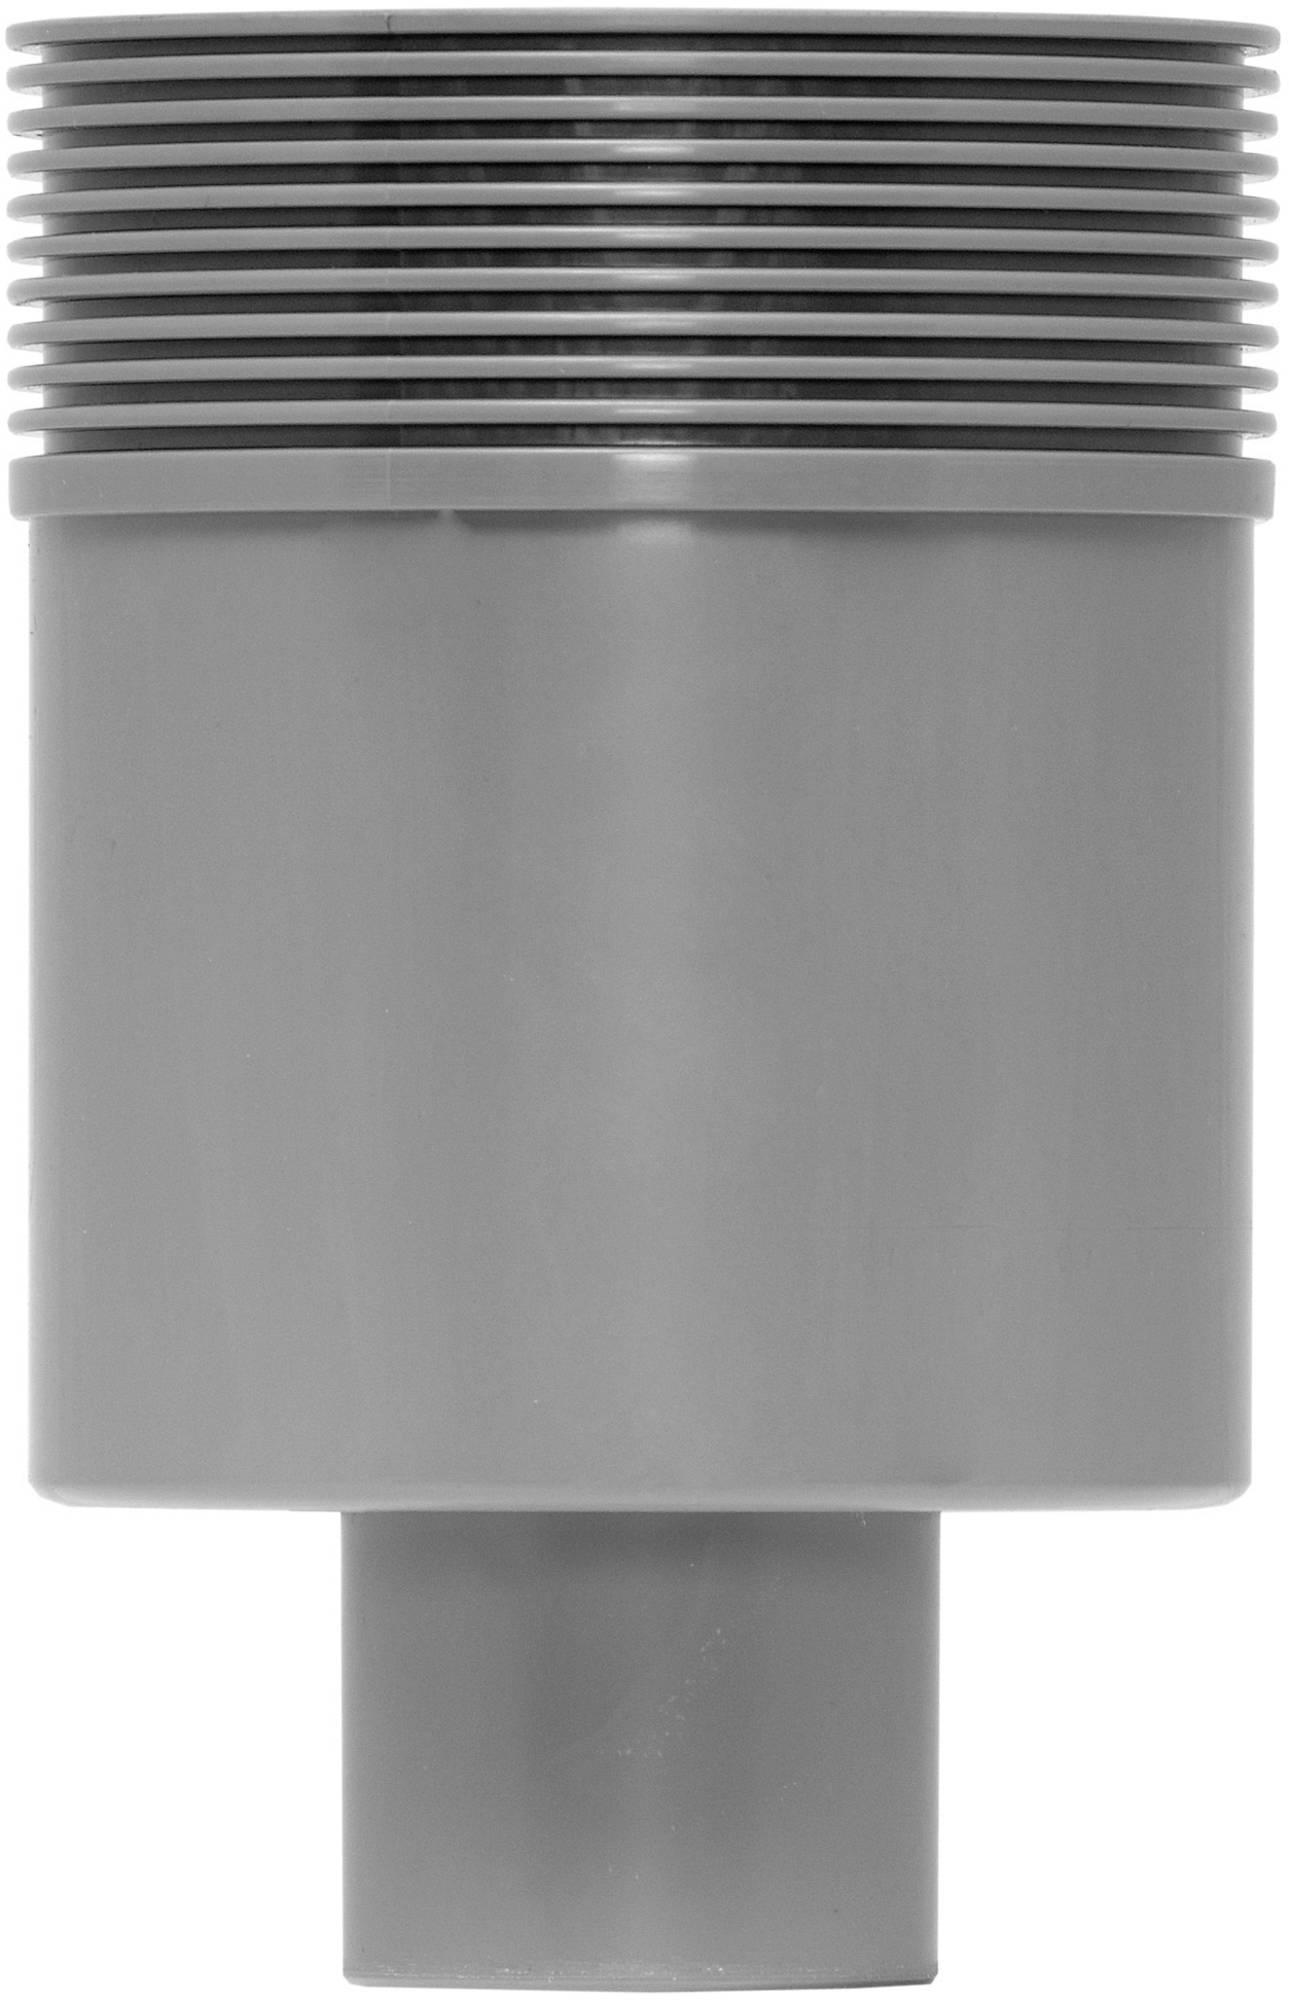 EASYDRAIN MULTI sifon hoog onderuitlaat 50mm. (EDMSI3)